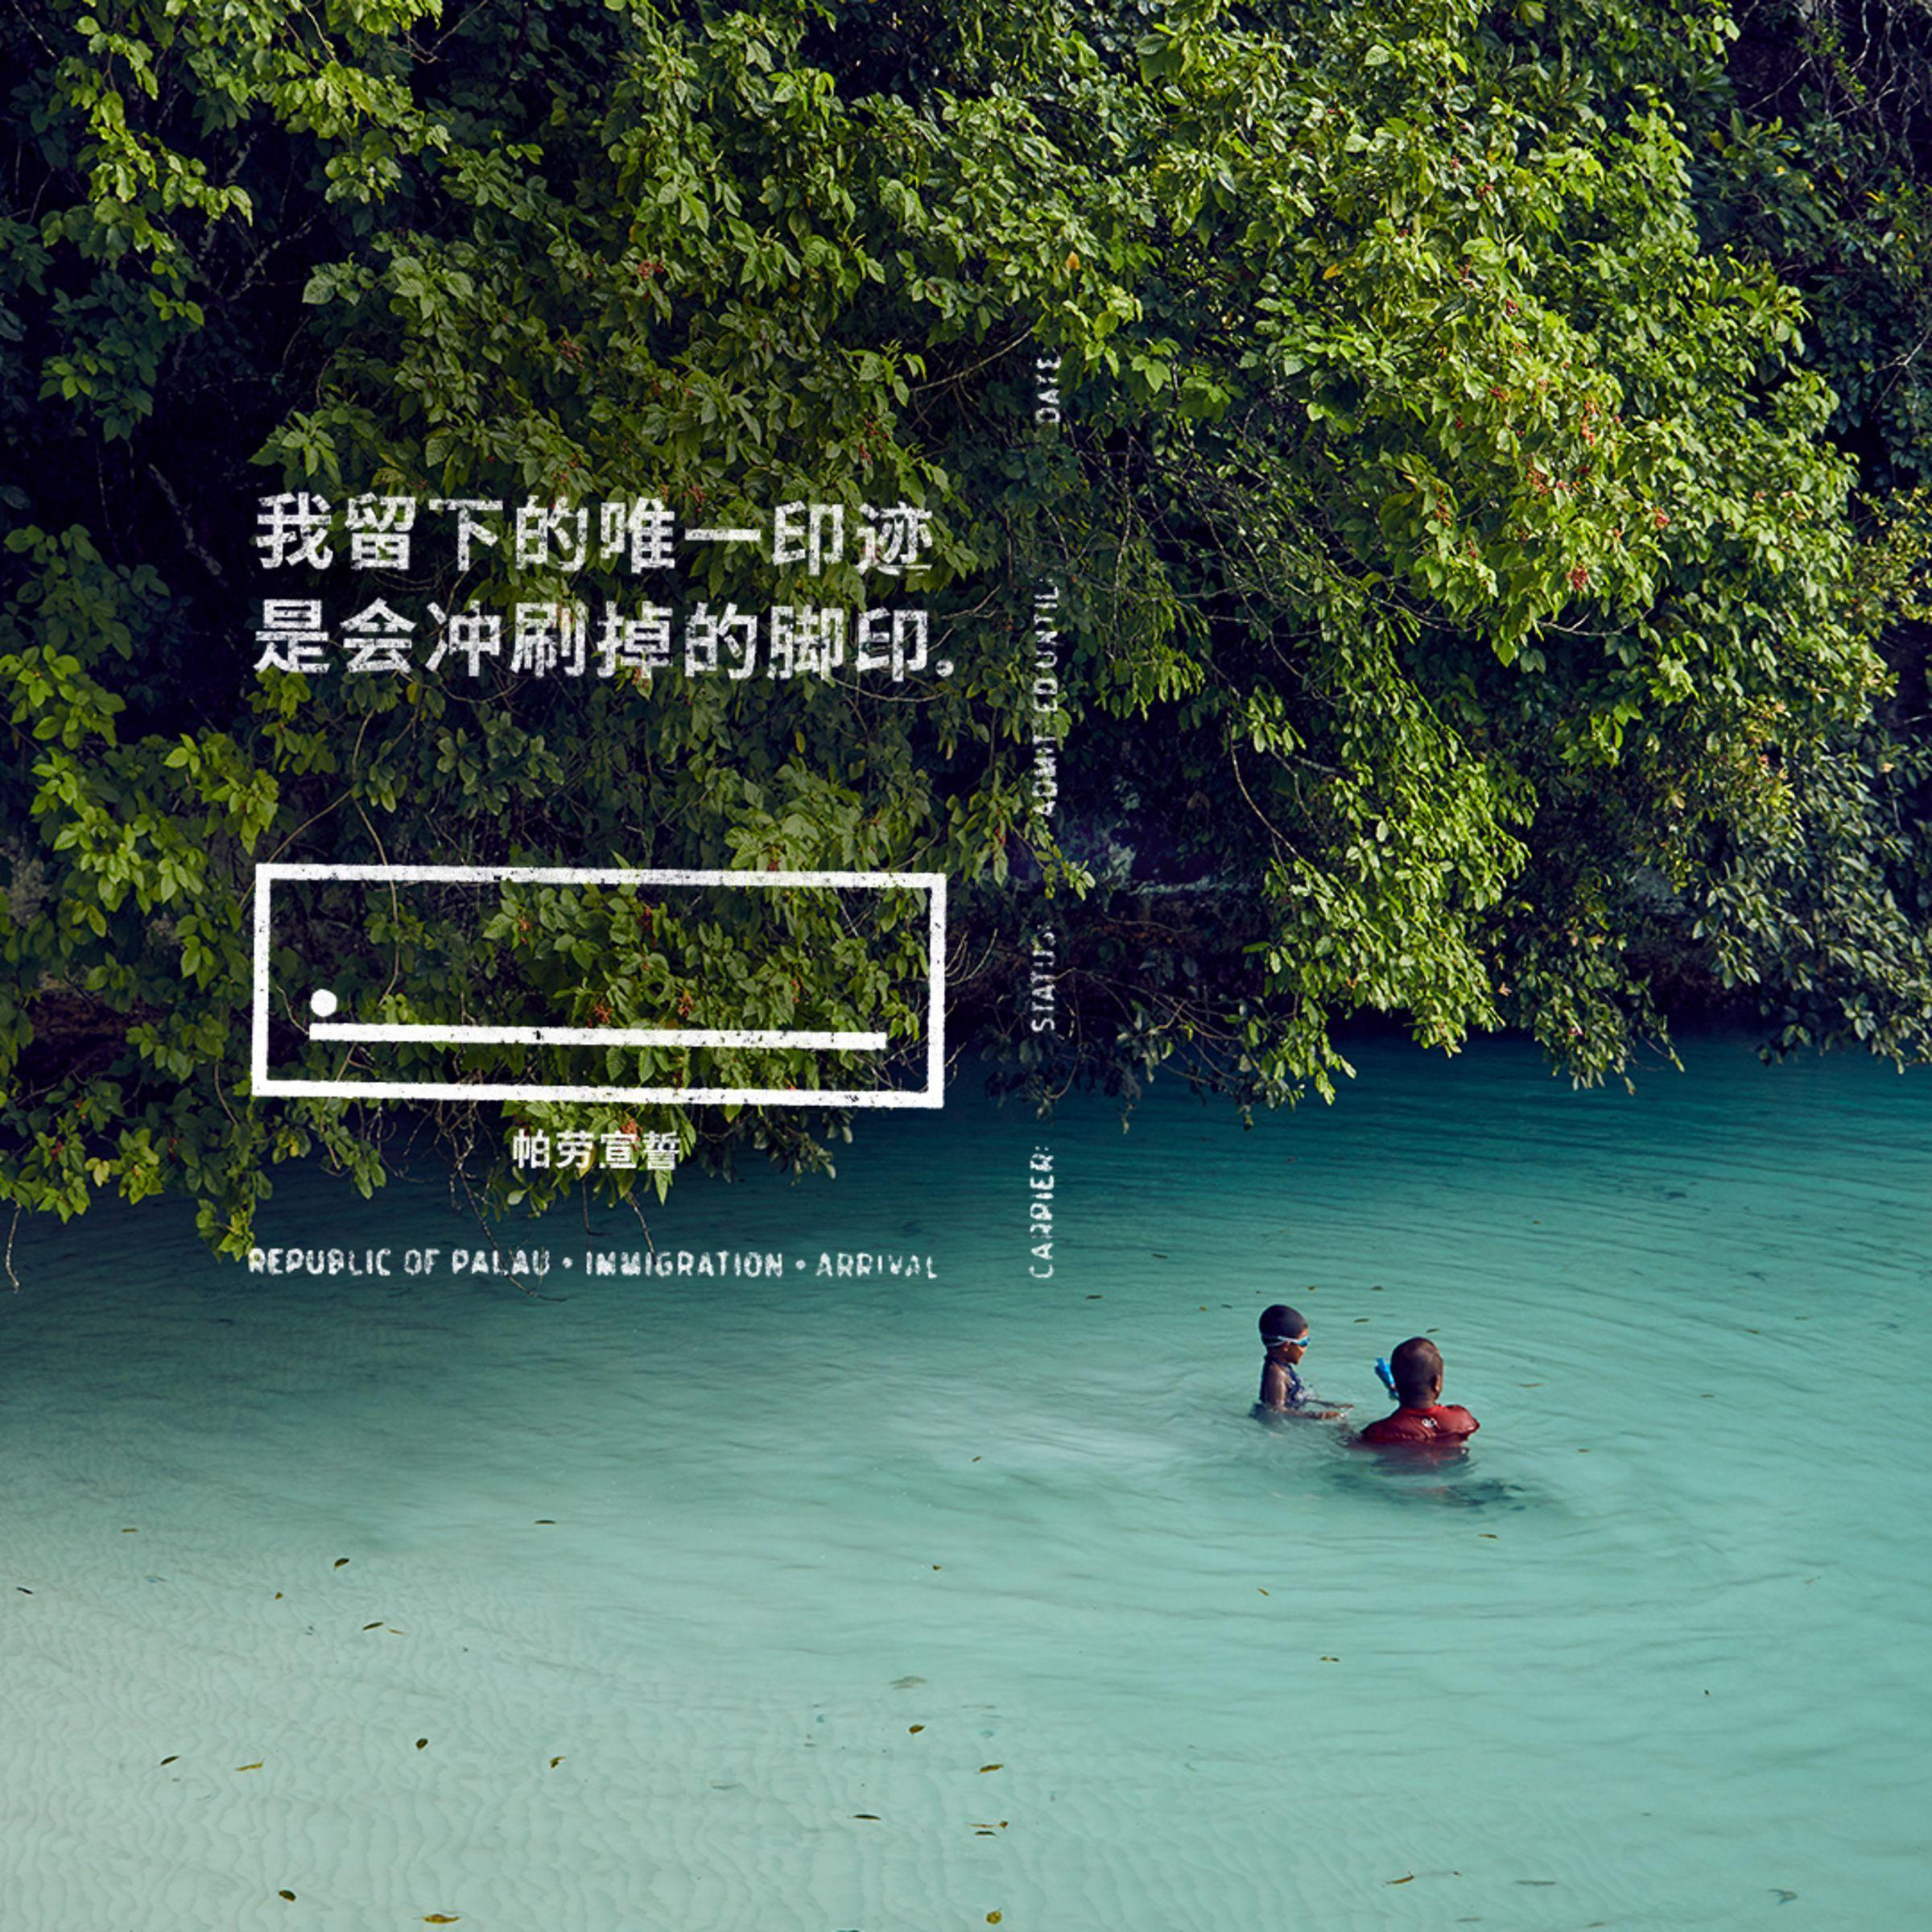 Design Bank Palau.Palau Pledge Environmental Responsibility On Passport Campaign